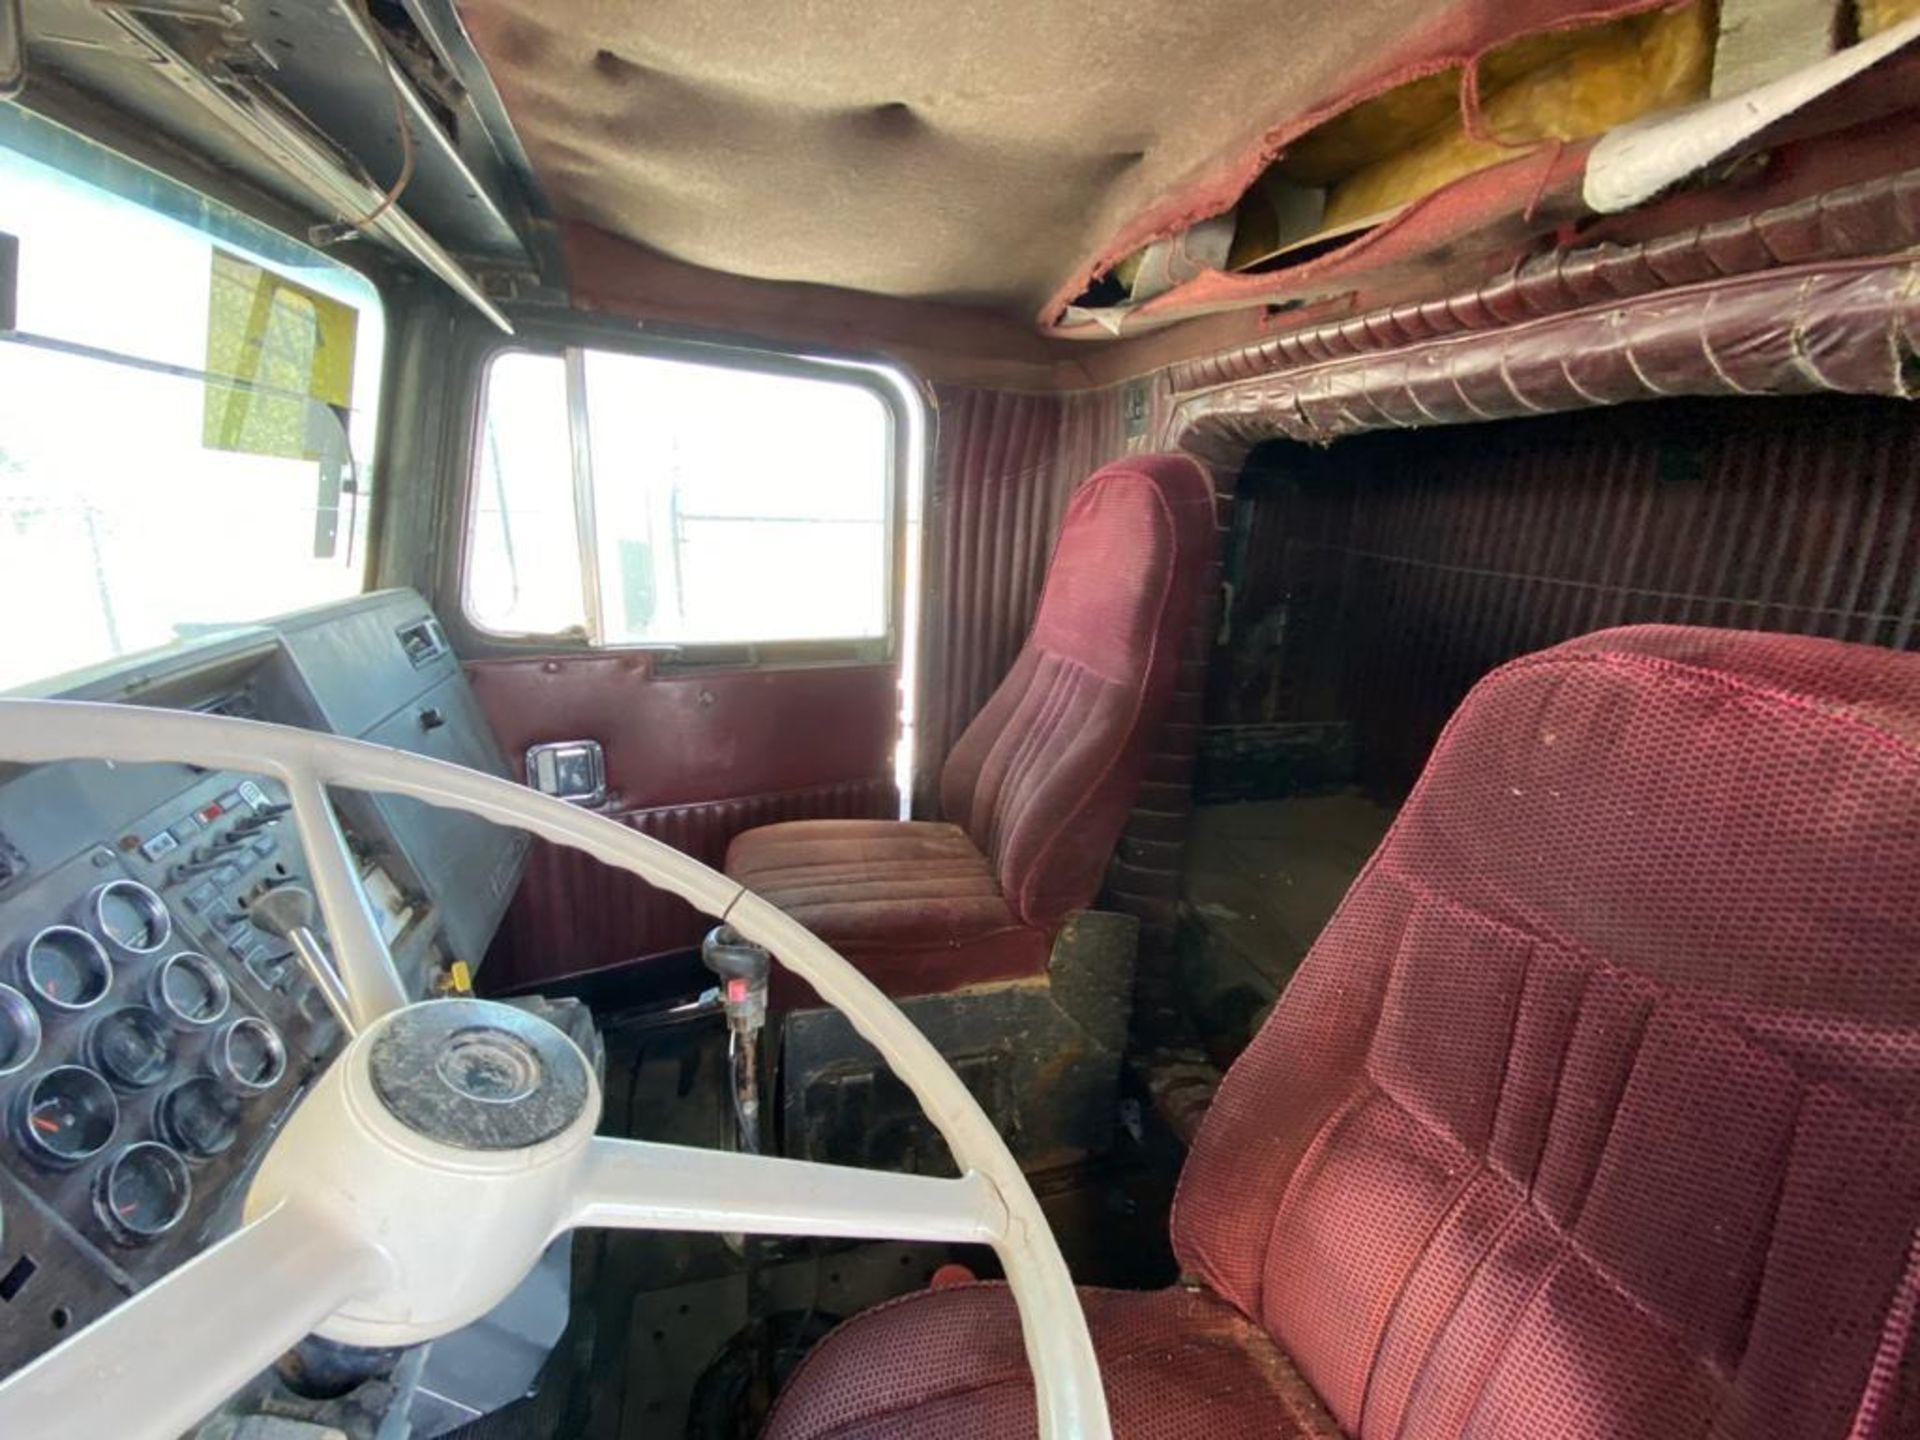 1983 Kenworth Dump Truck, standard transmission of 10 speeds, with Cummins motor - Image 62 of 68